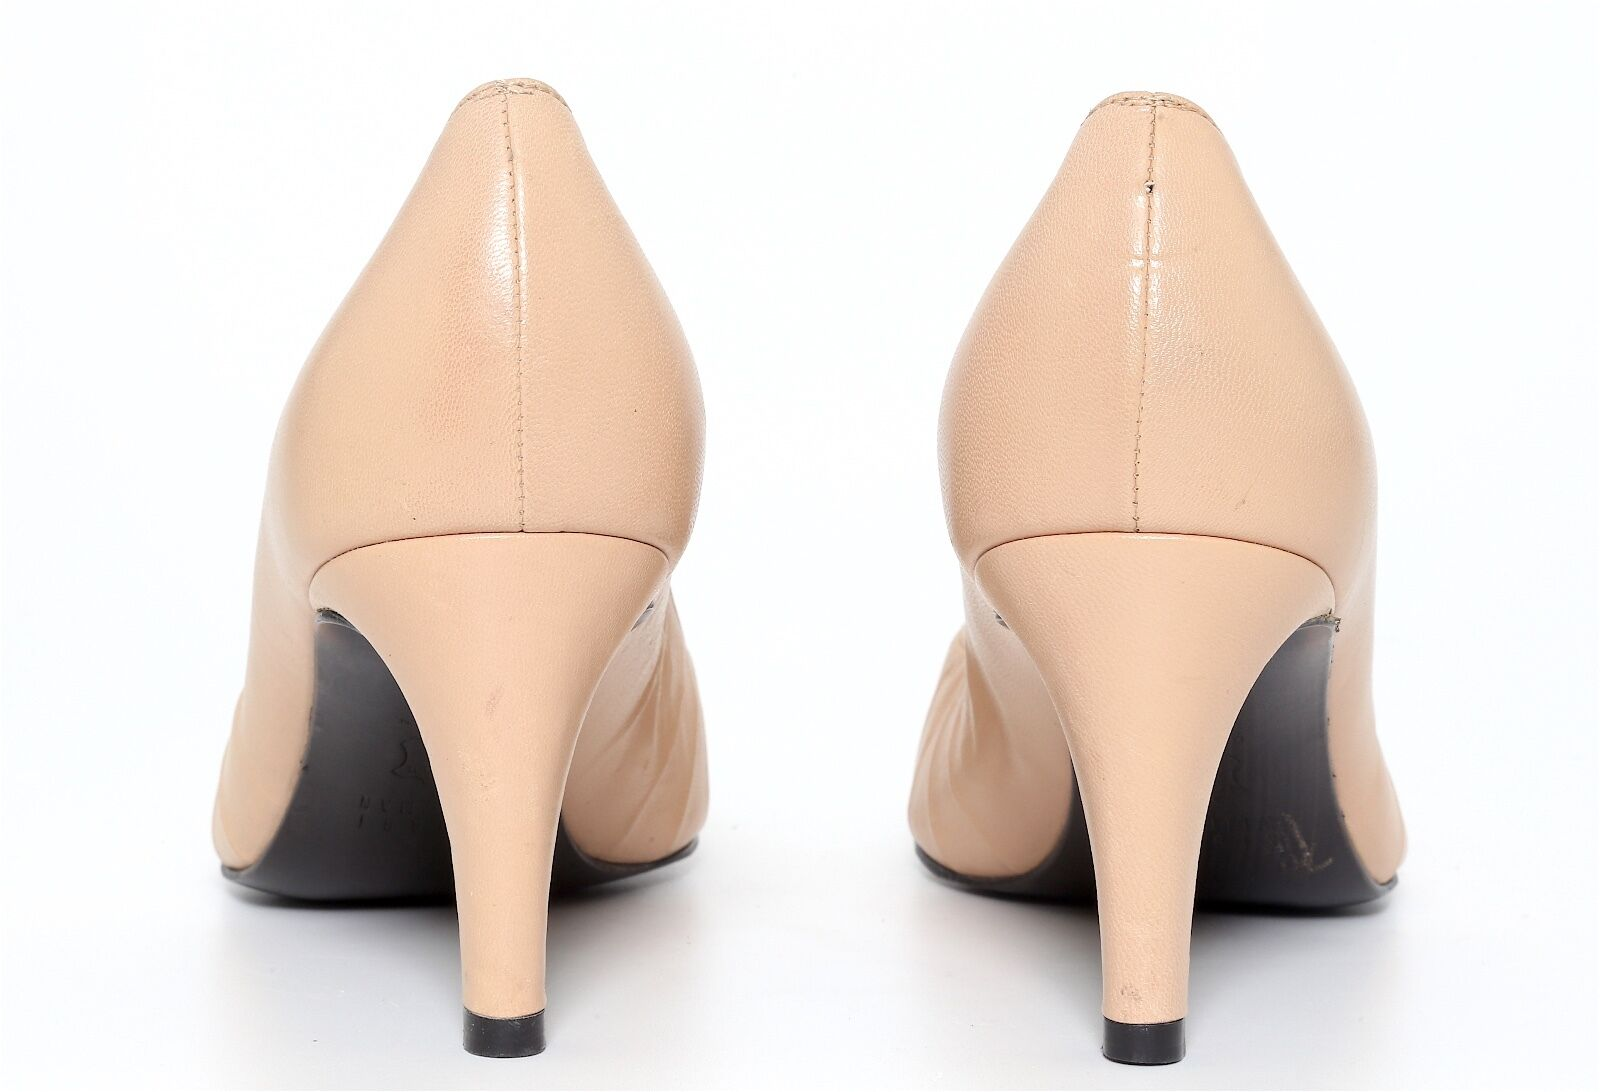 Stuart Weitzman Women's Leather Leather Leather Beige Pointed Toe Heels 3490 Sz 5 M 3d4a25